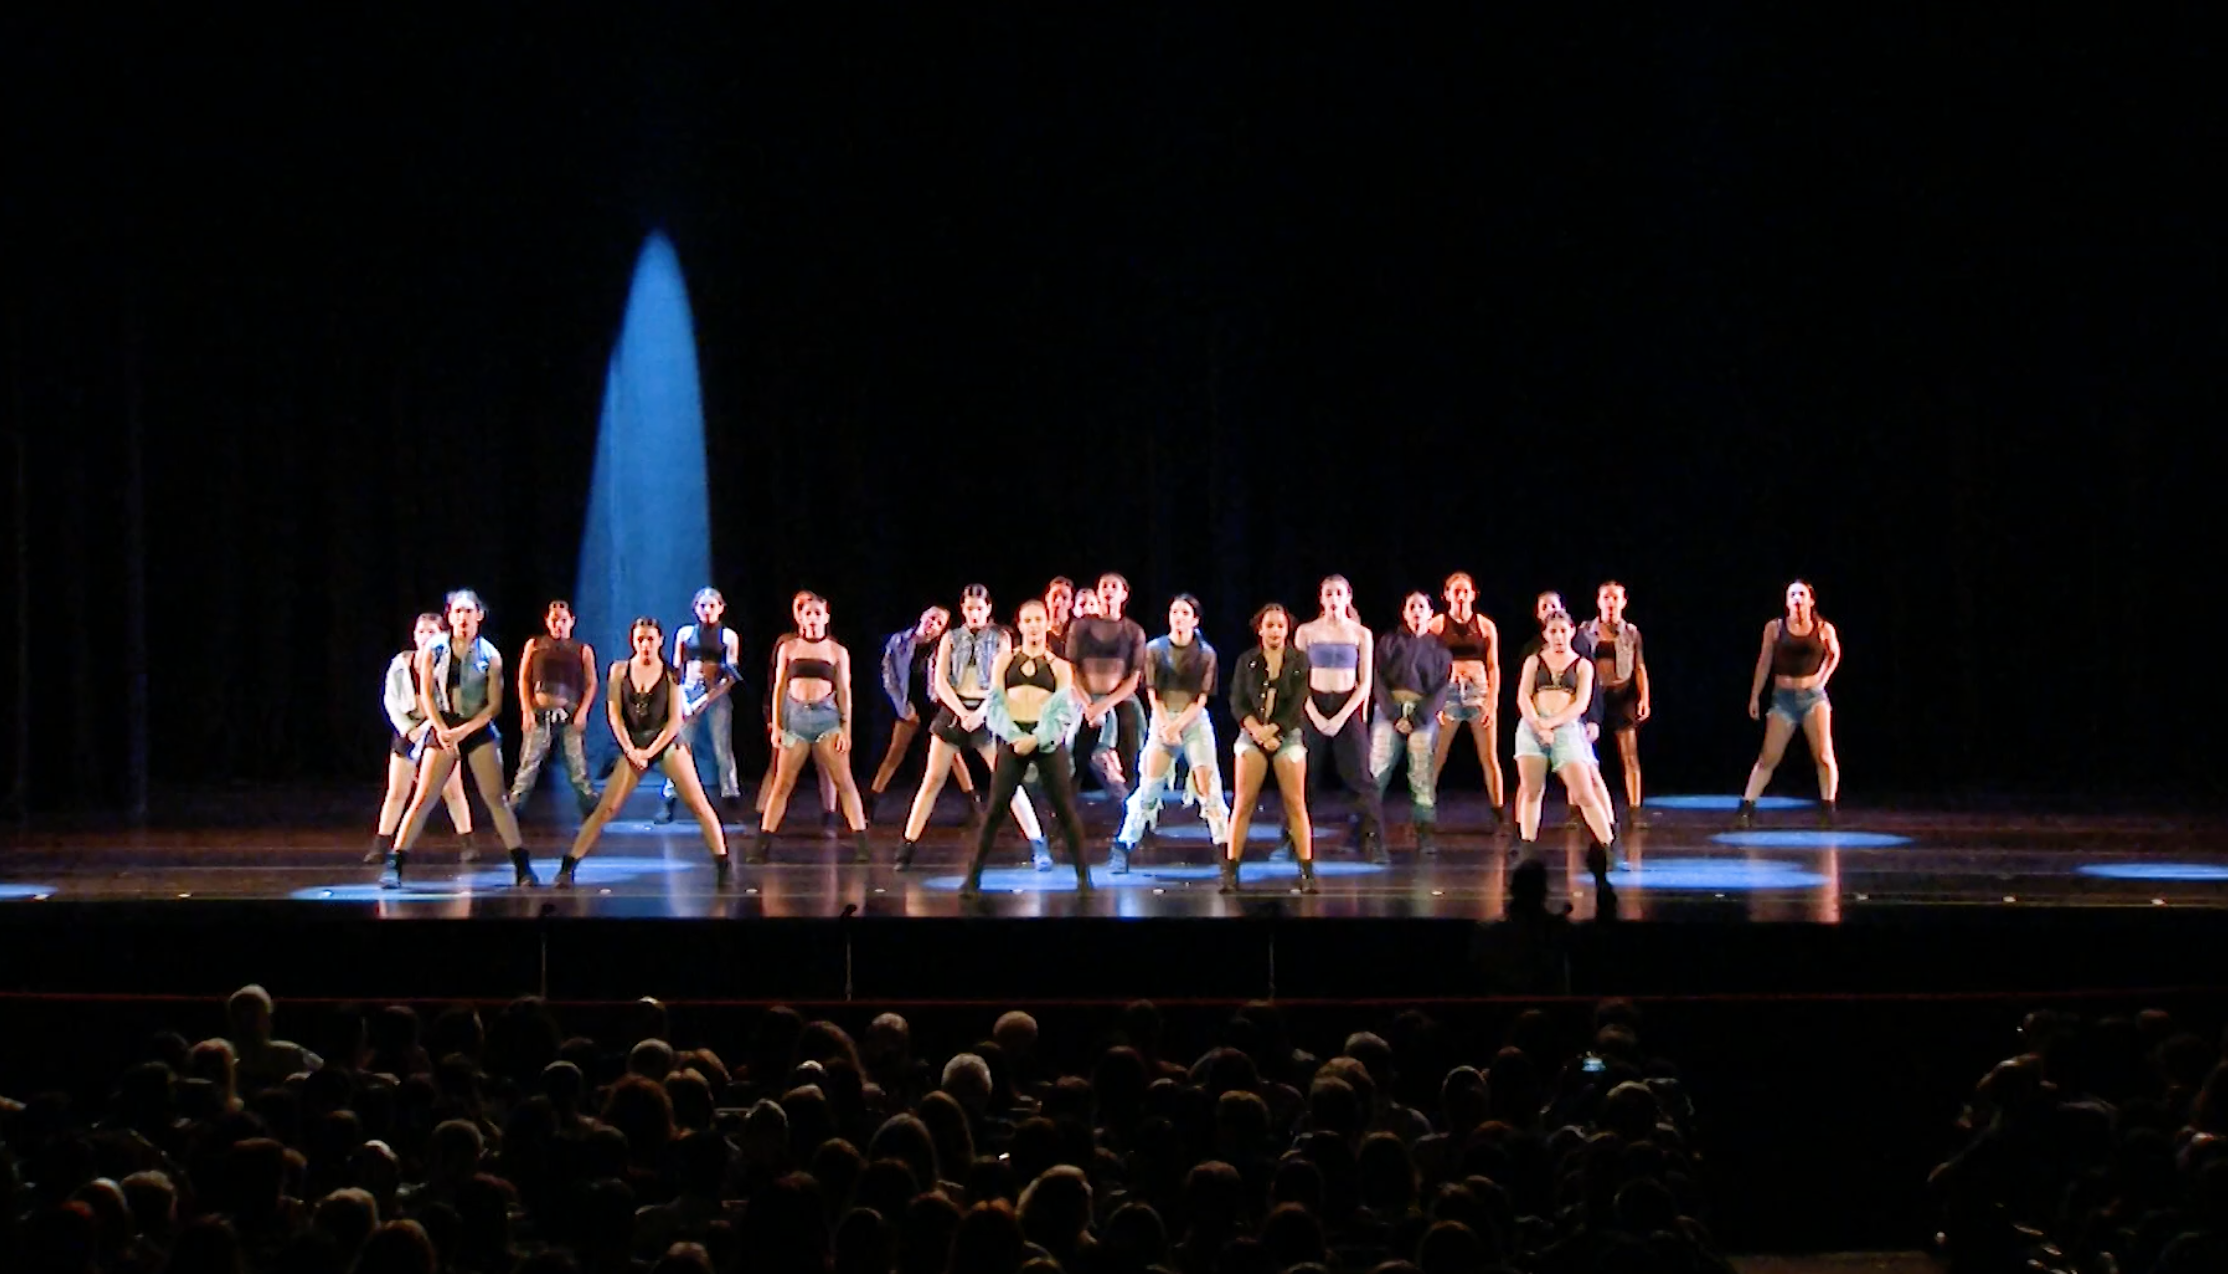 Slay - Miami Dance Academy